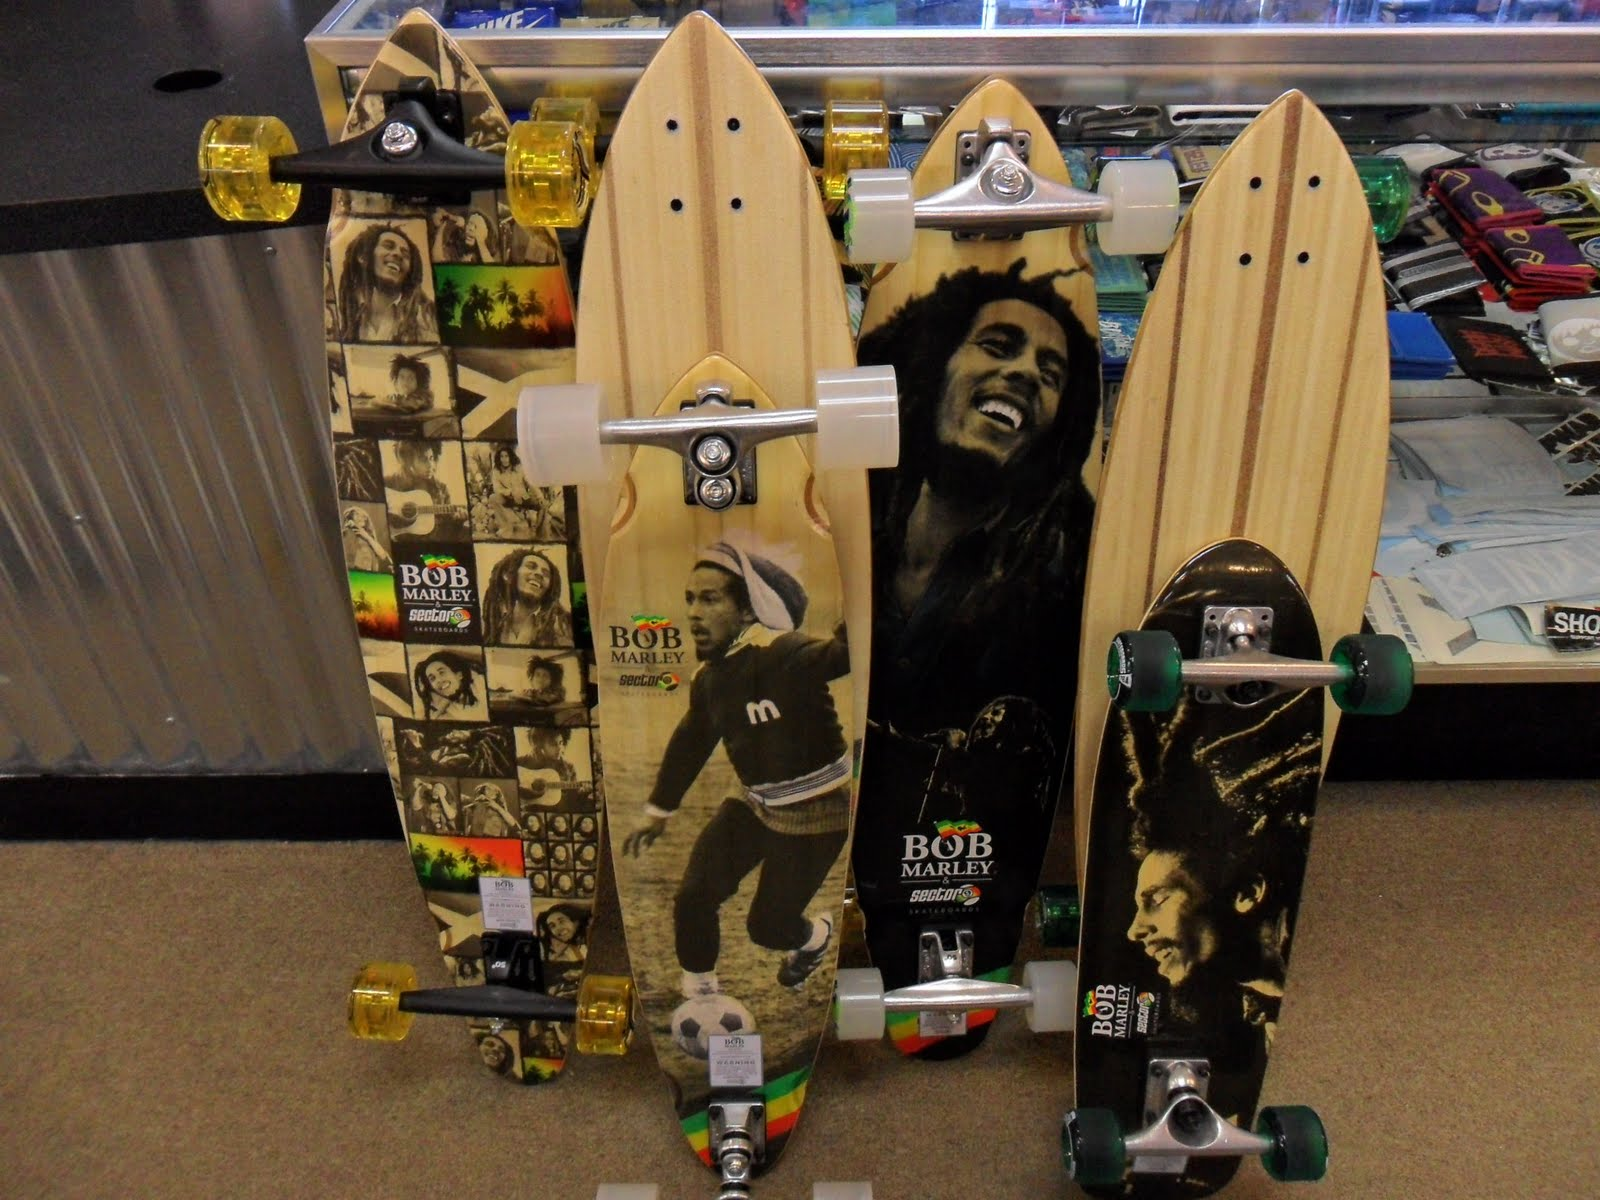 Blindside of Layton: Bob Marley x Sector 9 Longboard Sector 9 Bob Marley